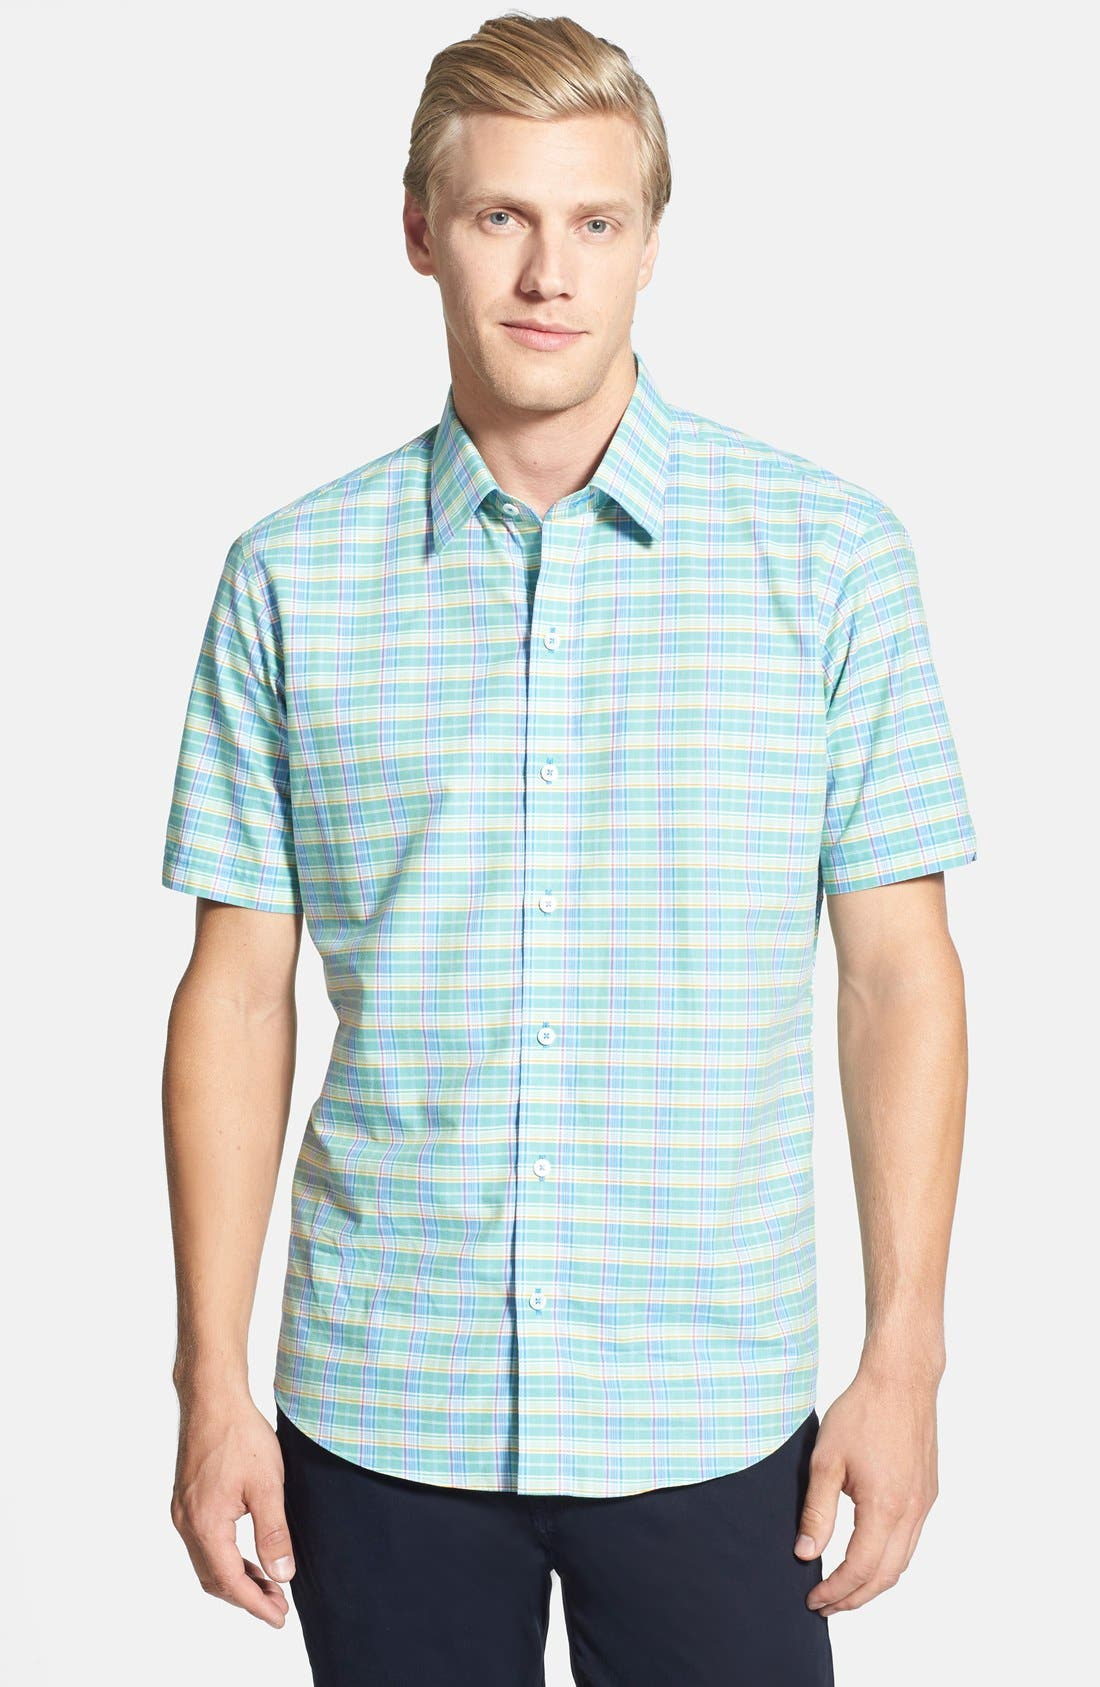 Alternate Image 1 Selected - Zachary Prell 'Escobosa' Standard Fit Short Sleeve Plaid Sport Shirt